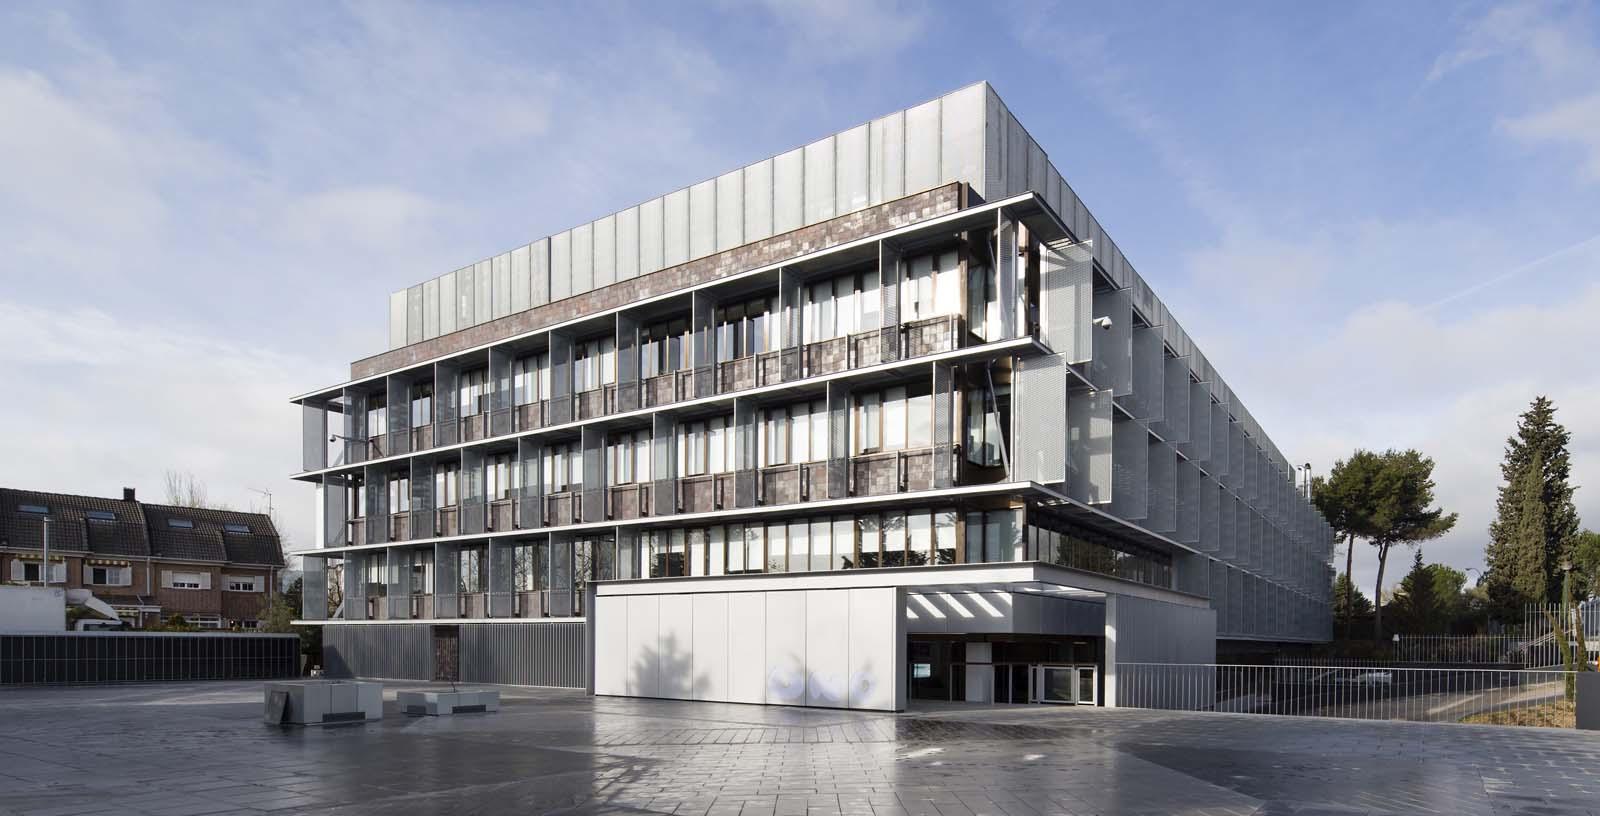 New_ONO_corporate_headquarters_01_Architecture_IDOM_photos_Miguel_de_Guzm_n